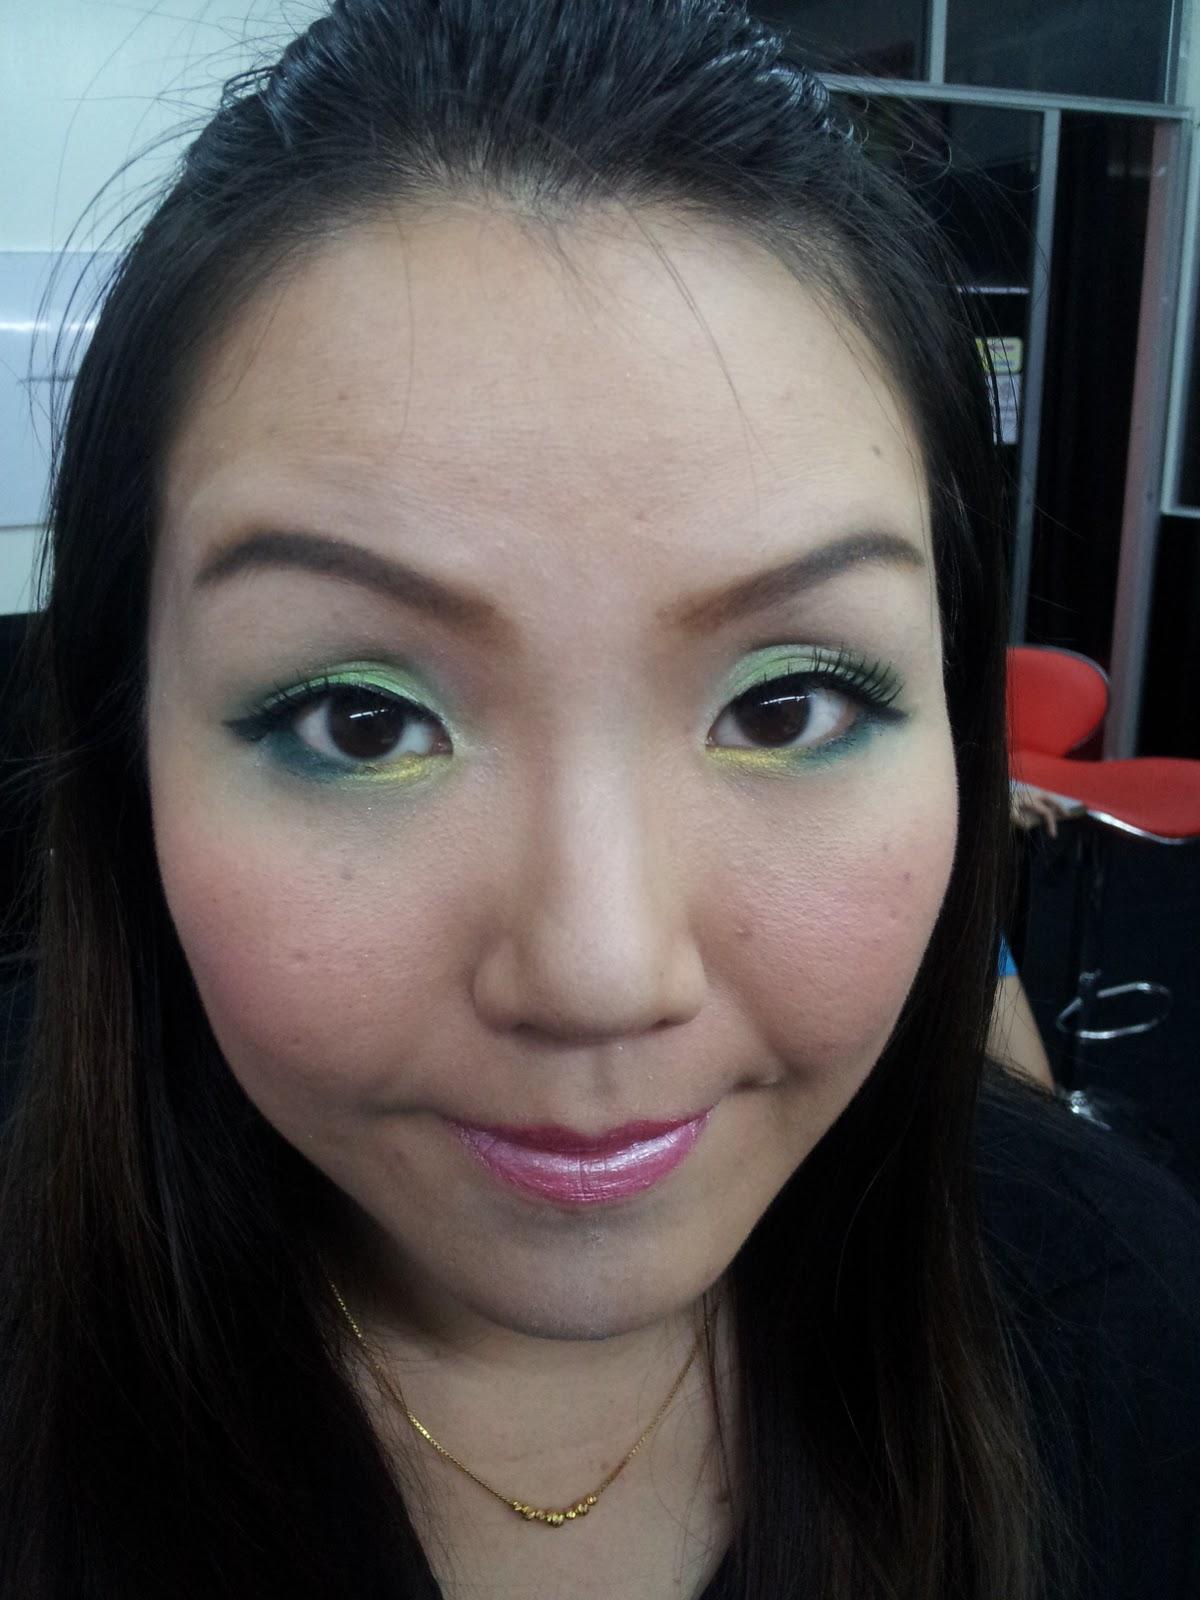 Makeup By Alinna You - Mugeek Vidalondon